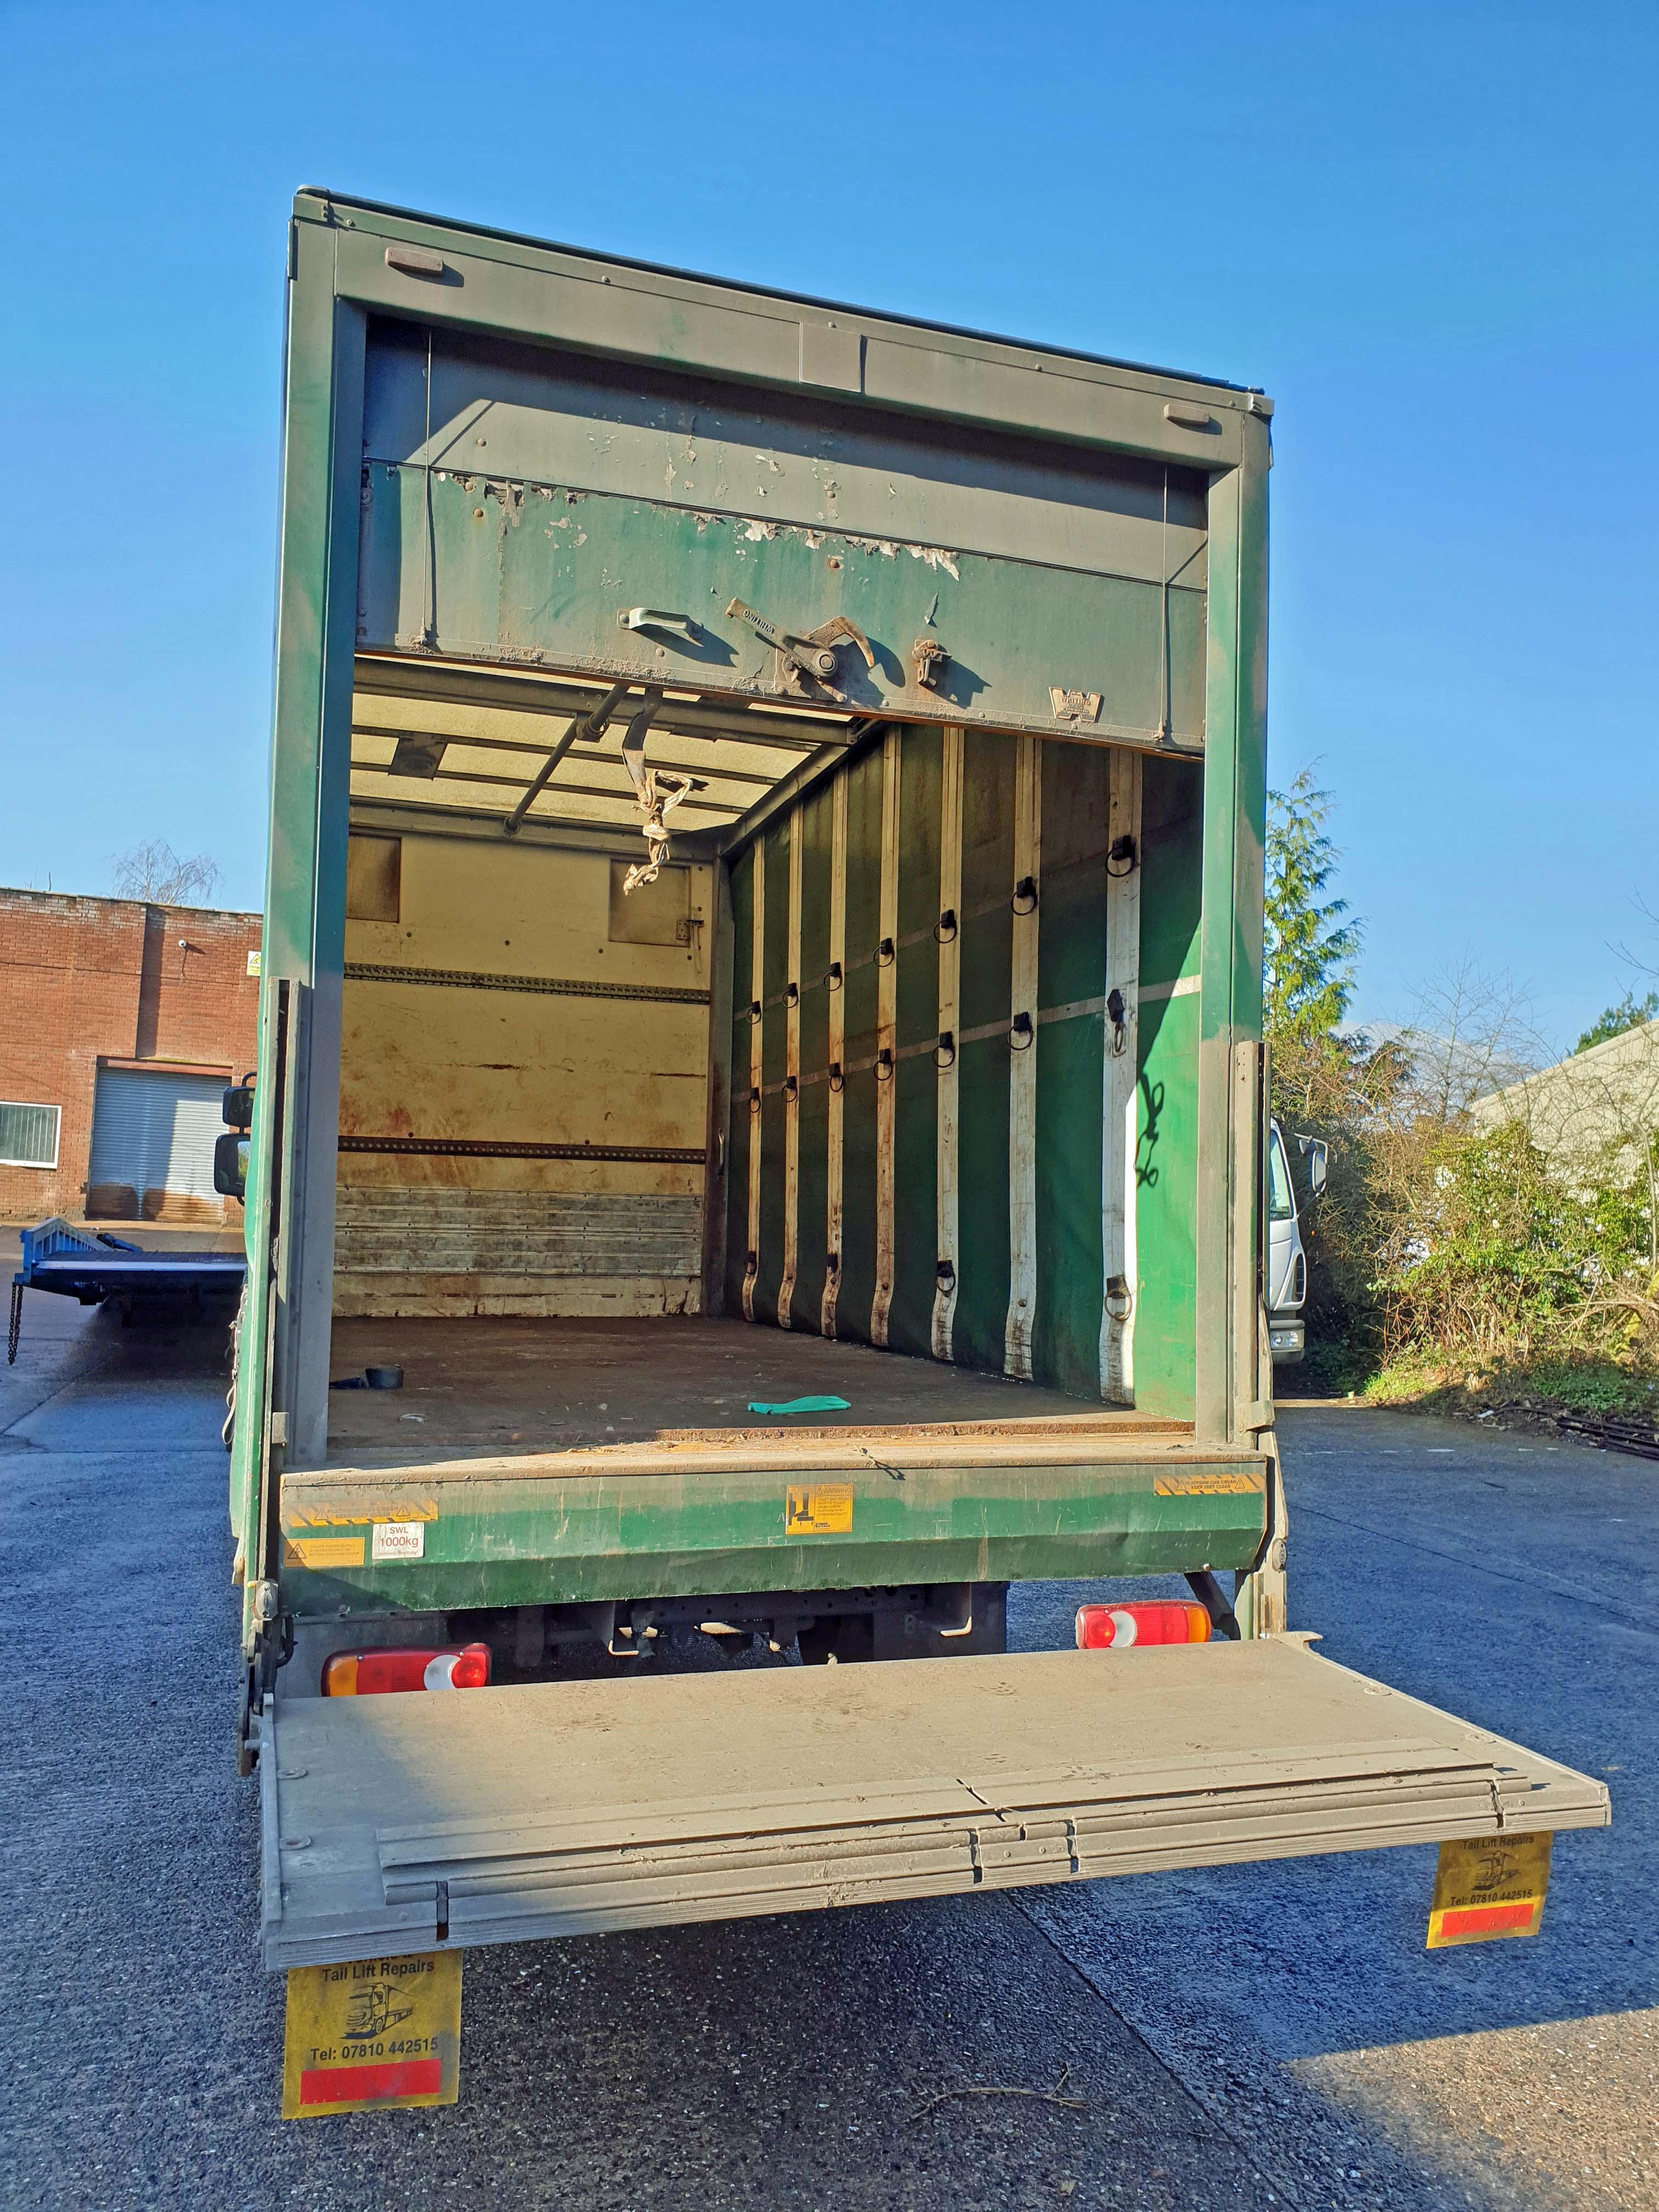 A DAF FA LF45.140 08 E 4461CC Euro4 4x2 7.5-Tonne Curtainside Truck, Registration No. RV59 FVA, - Image 4 of 11